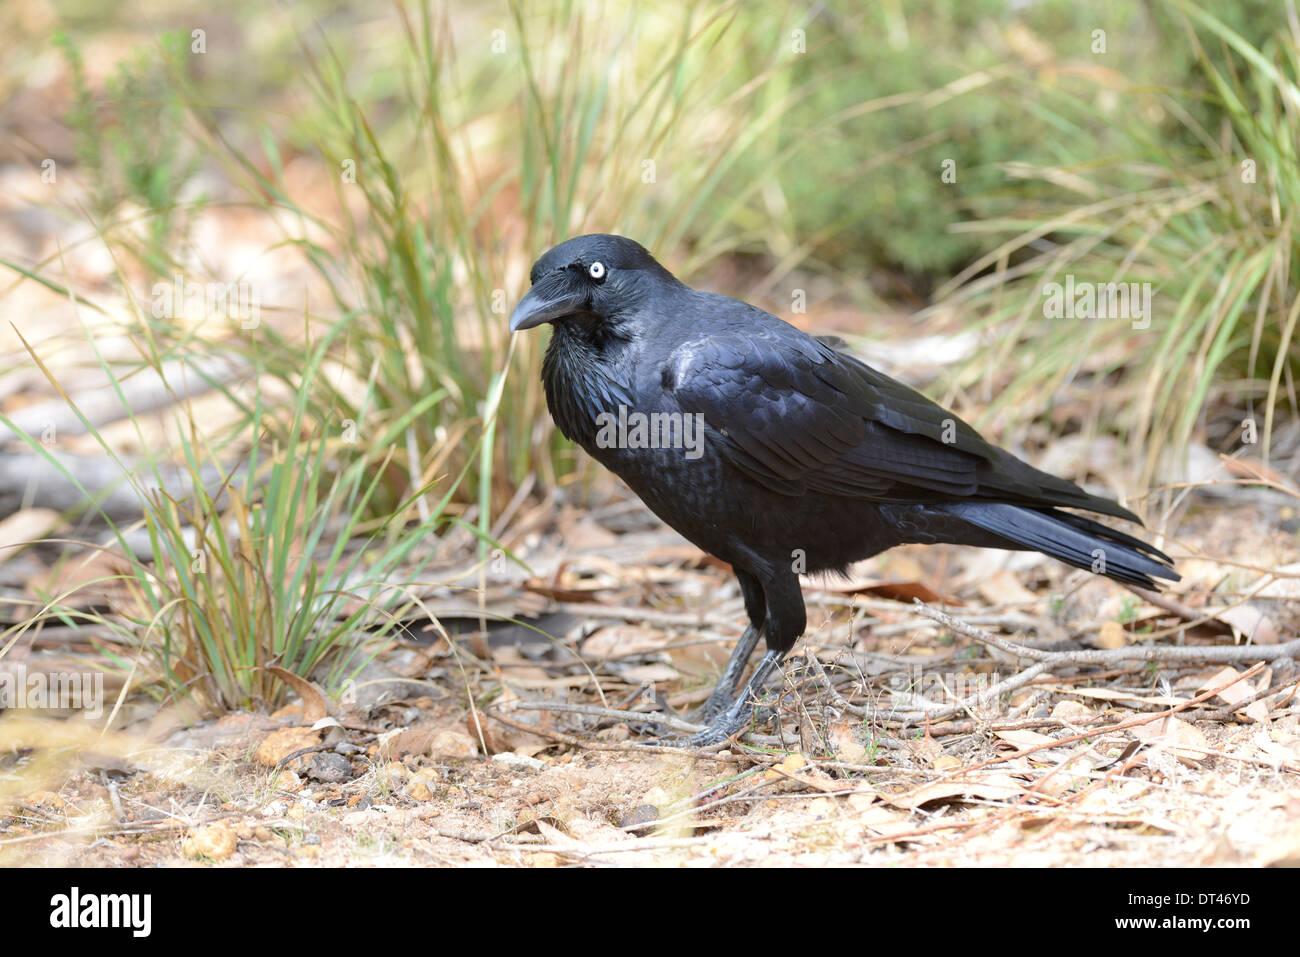 Australian raven (Corvus coronoides) foraging for food in scrub land. - Stock Image